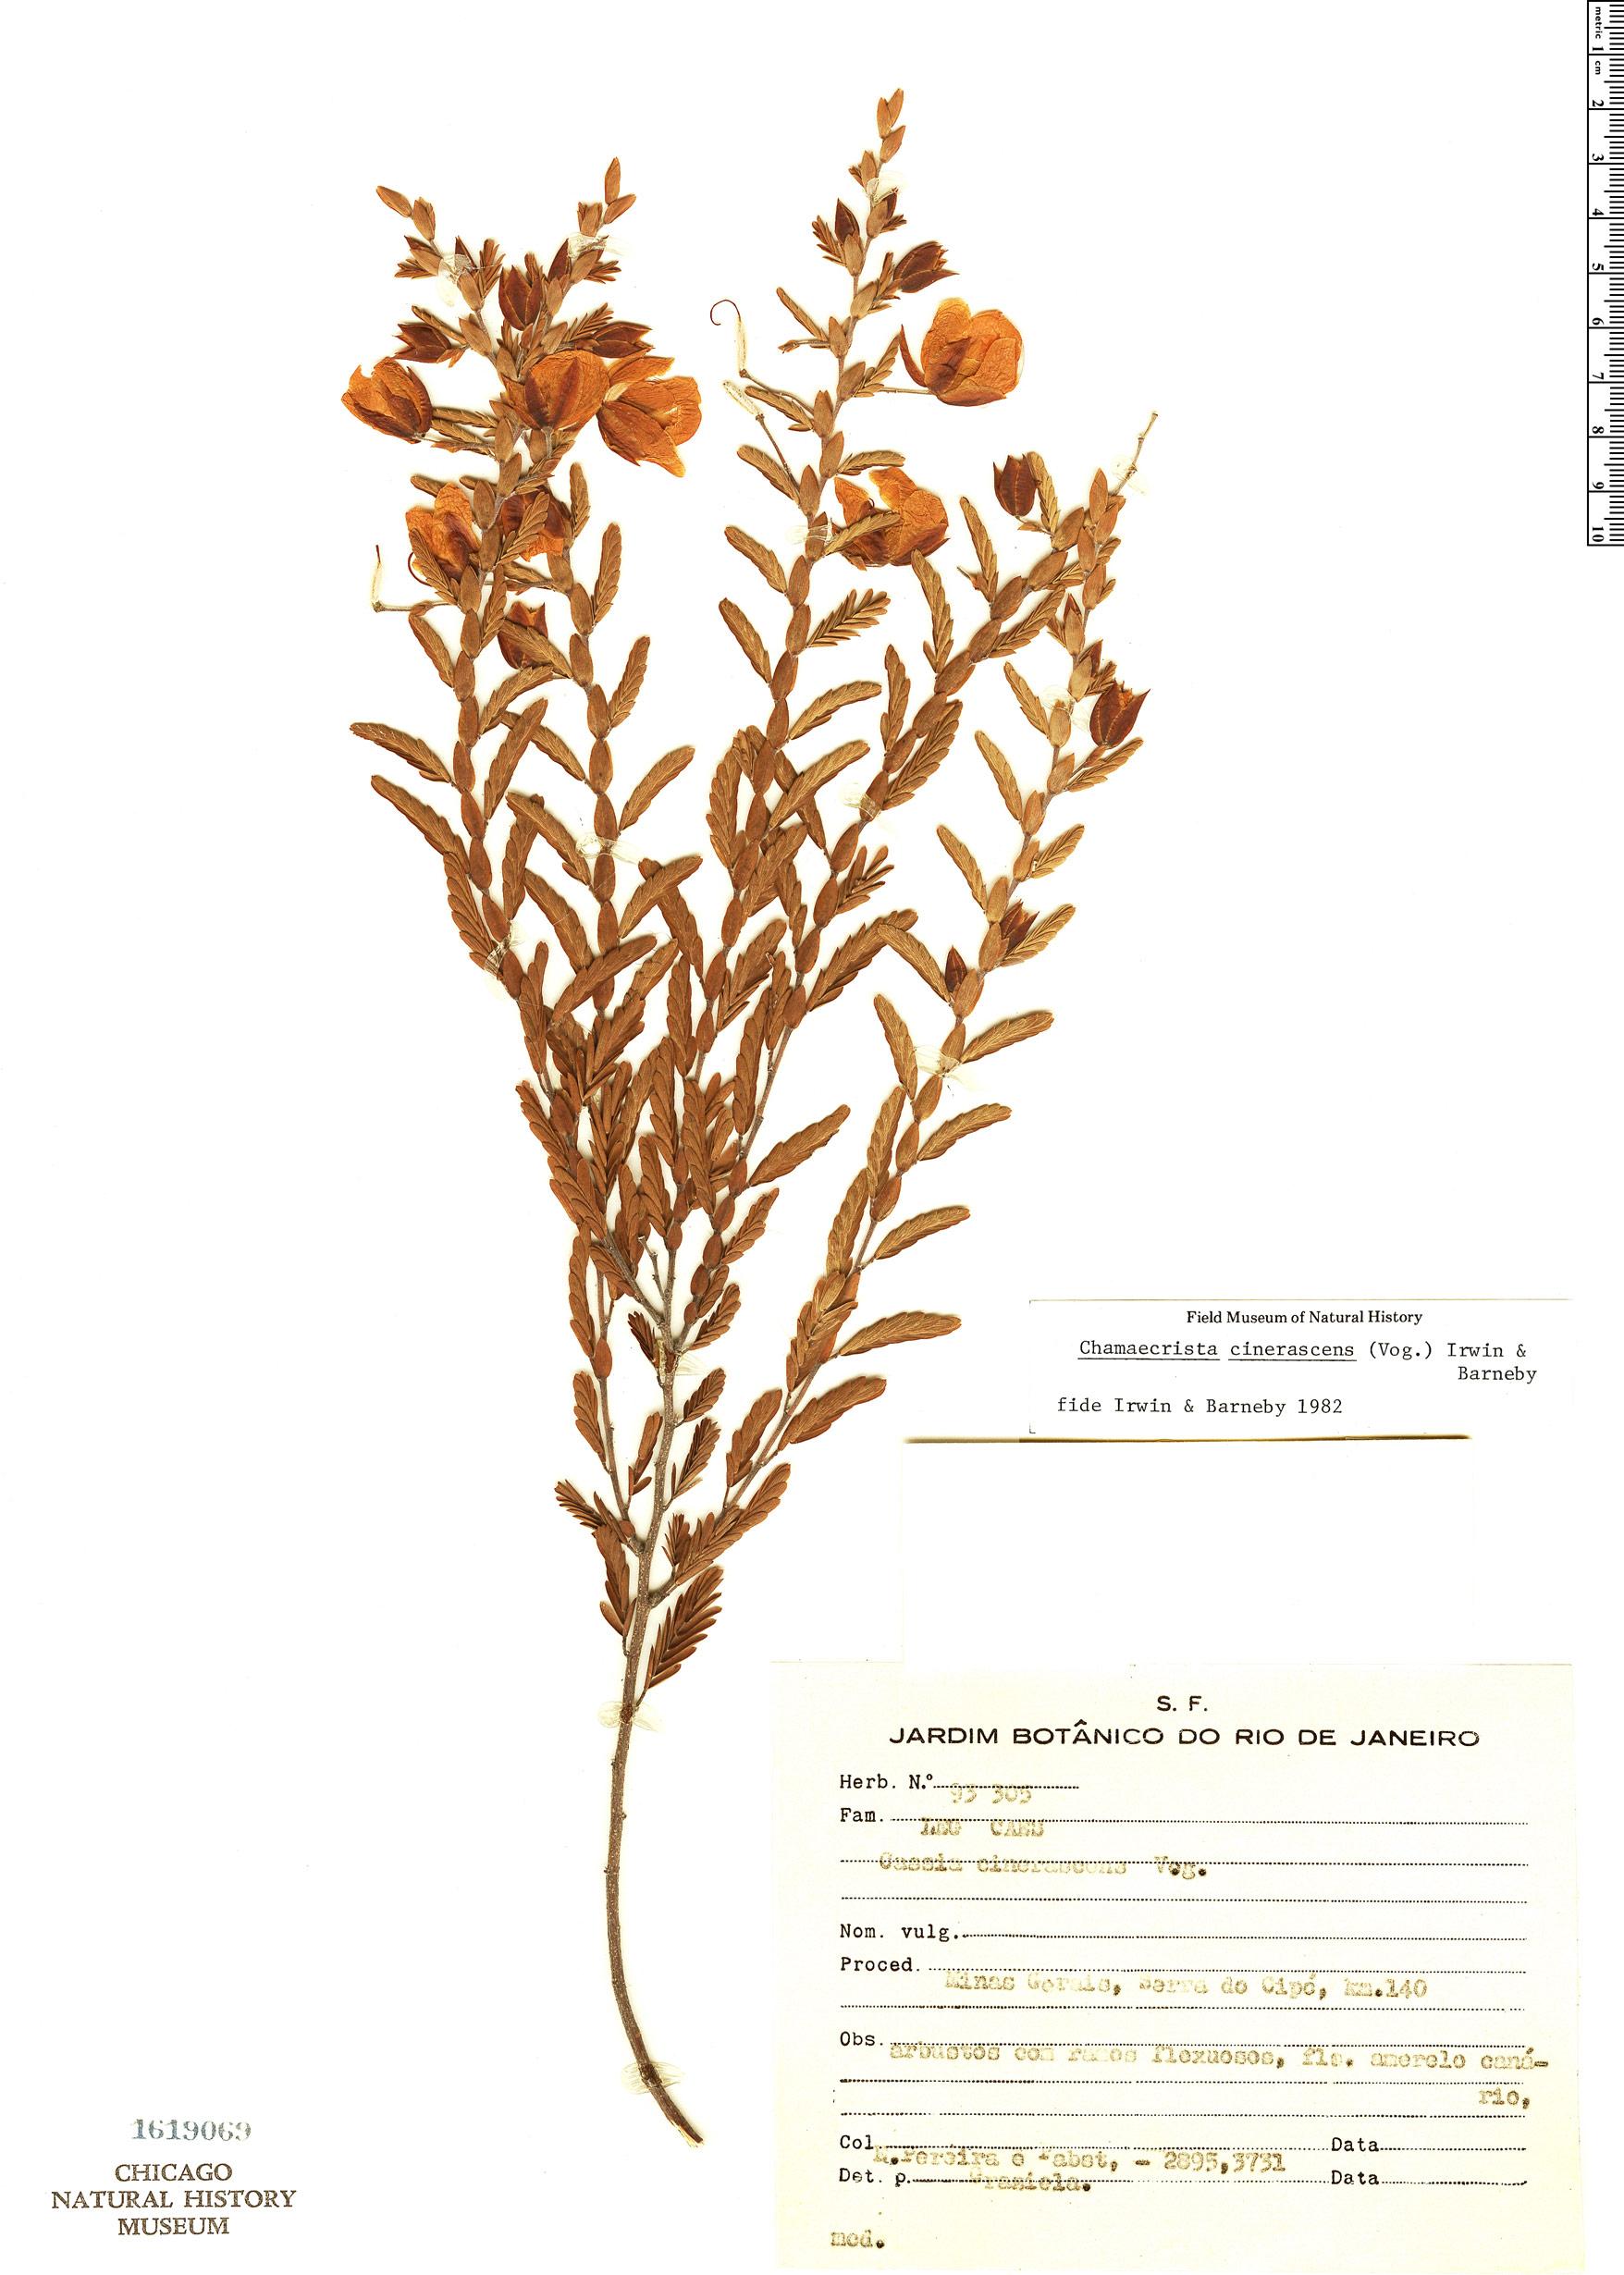 Specimen: Chamaecrista cinerascens